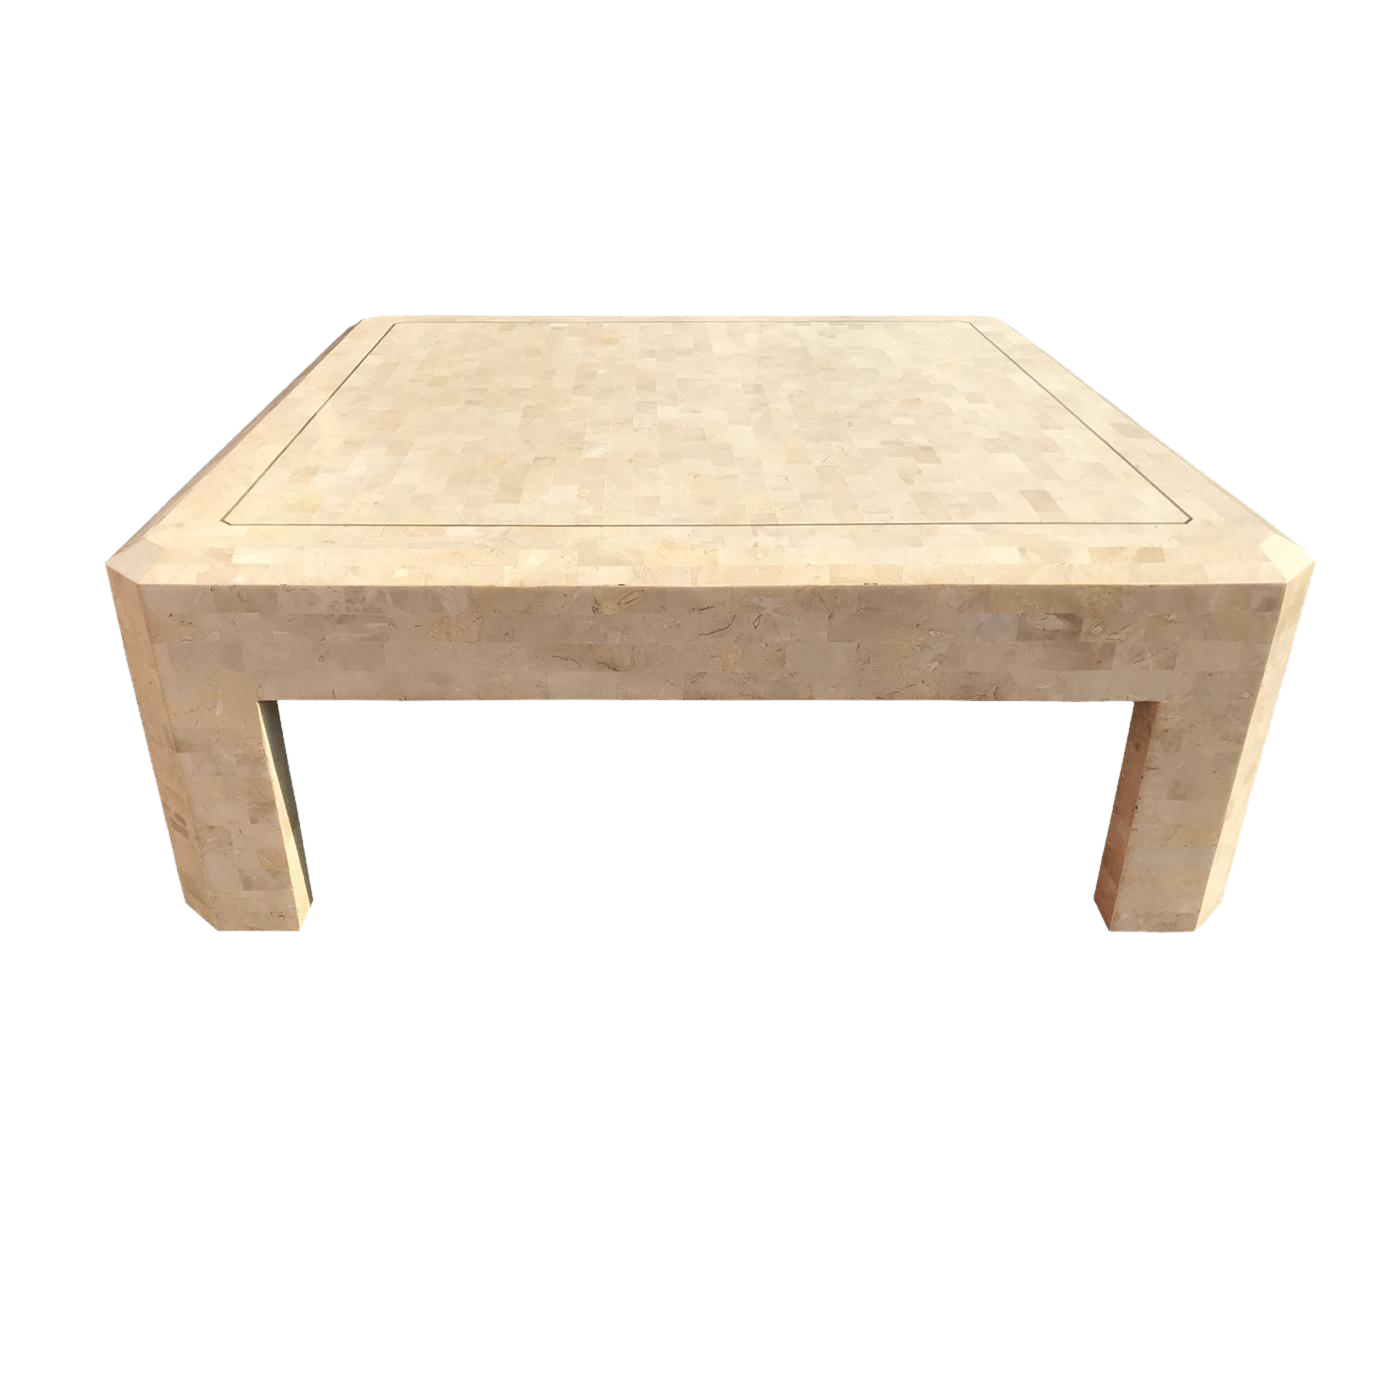 Superior Maitland Smith Tessellated Stone Coffee Table